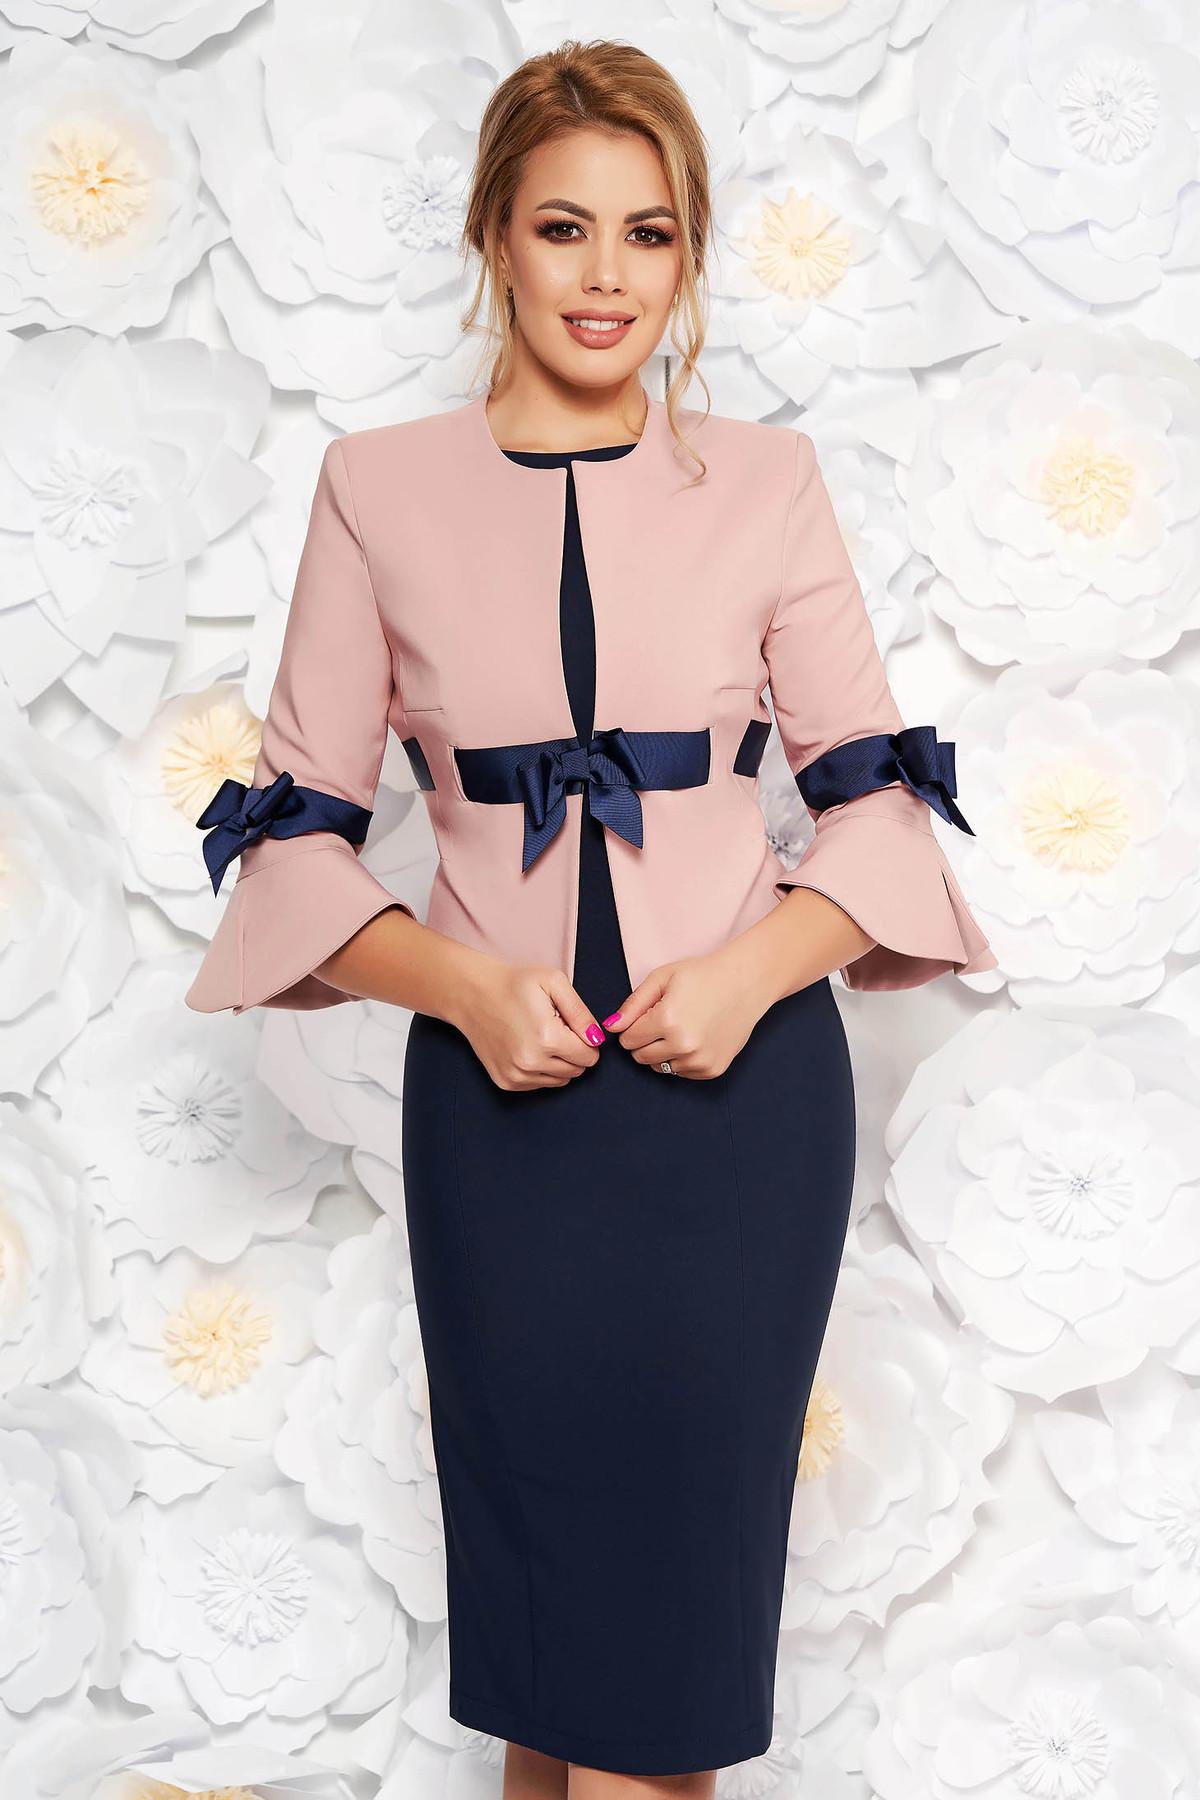 Compleu LaDonna rosa elegant din stofa cu sacou cambrat cu maneci clopot si rochie tip creion